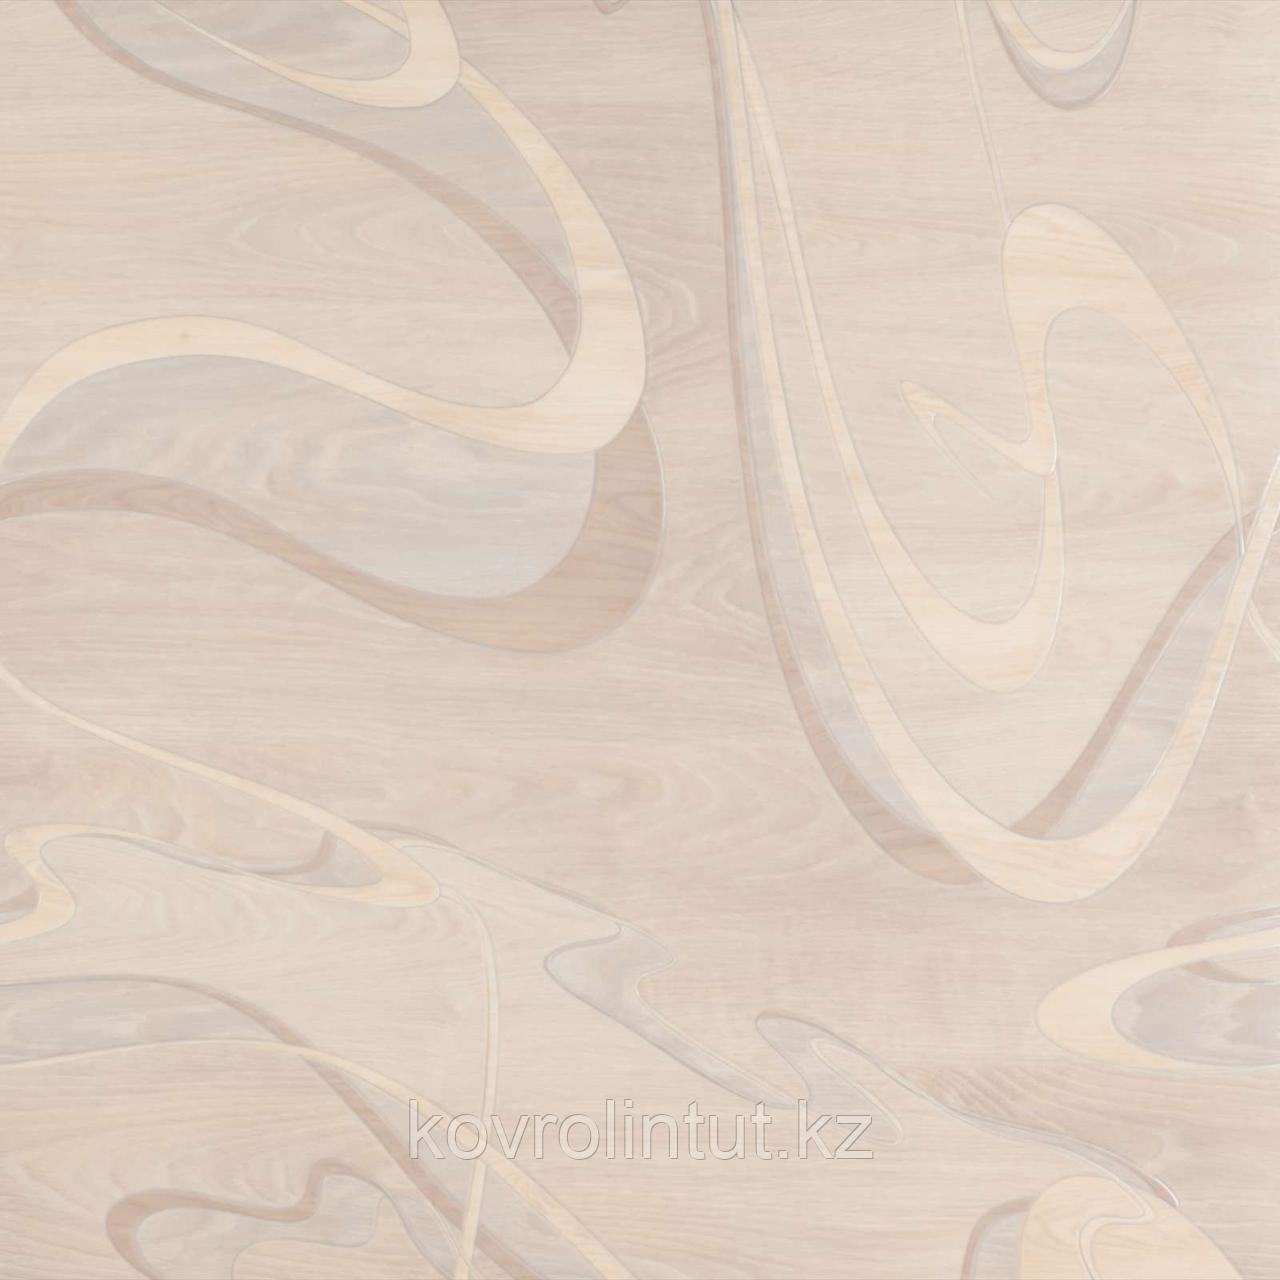 Линолеум Tarkett бытовой Grand Aston 2 2,5 м